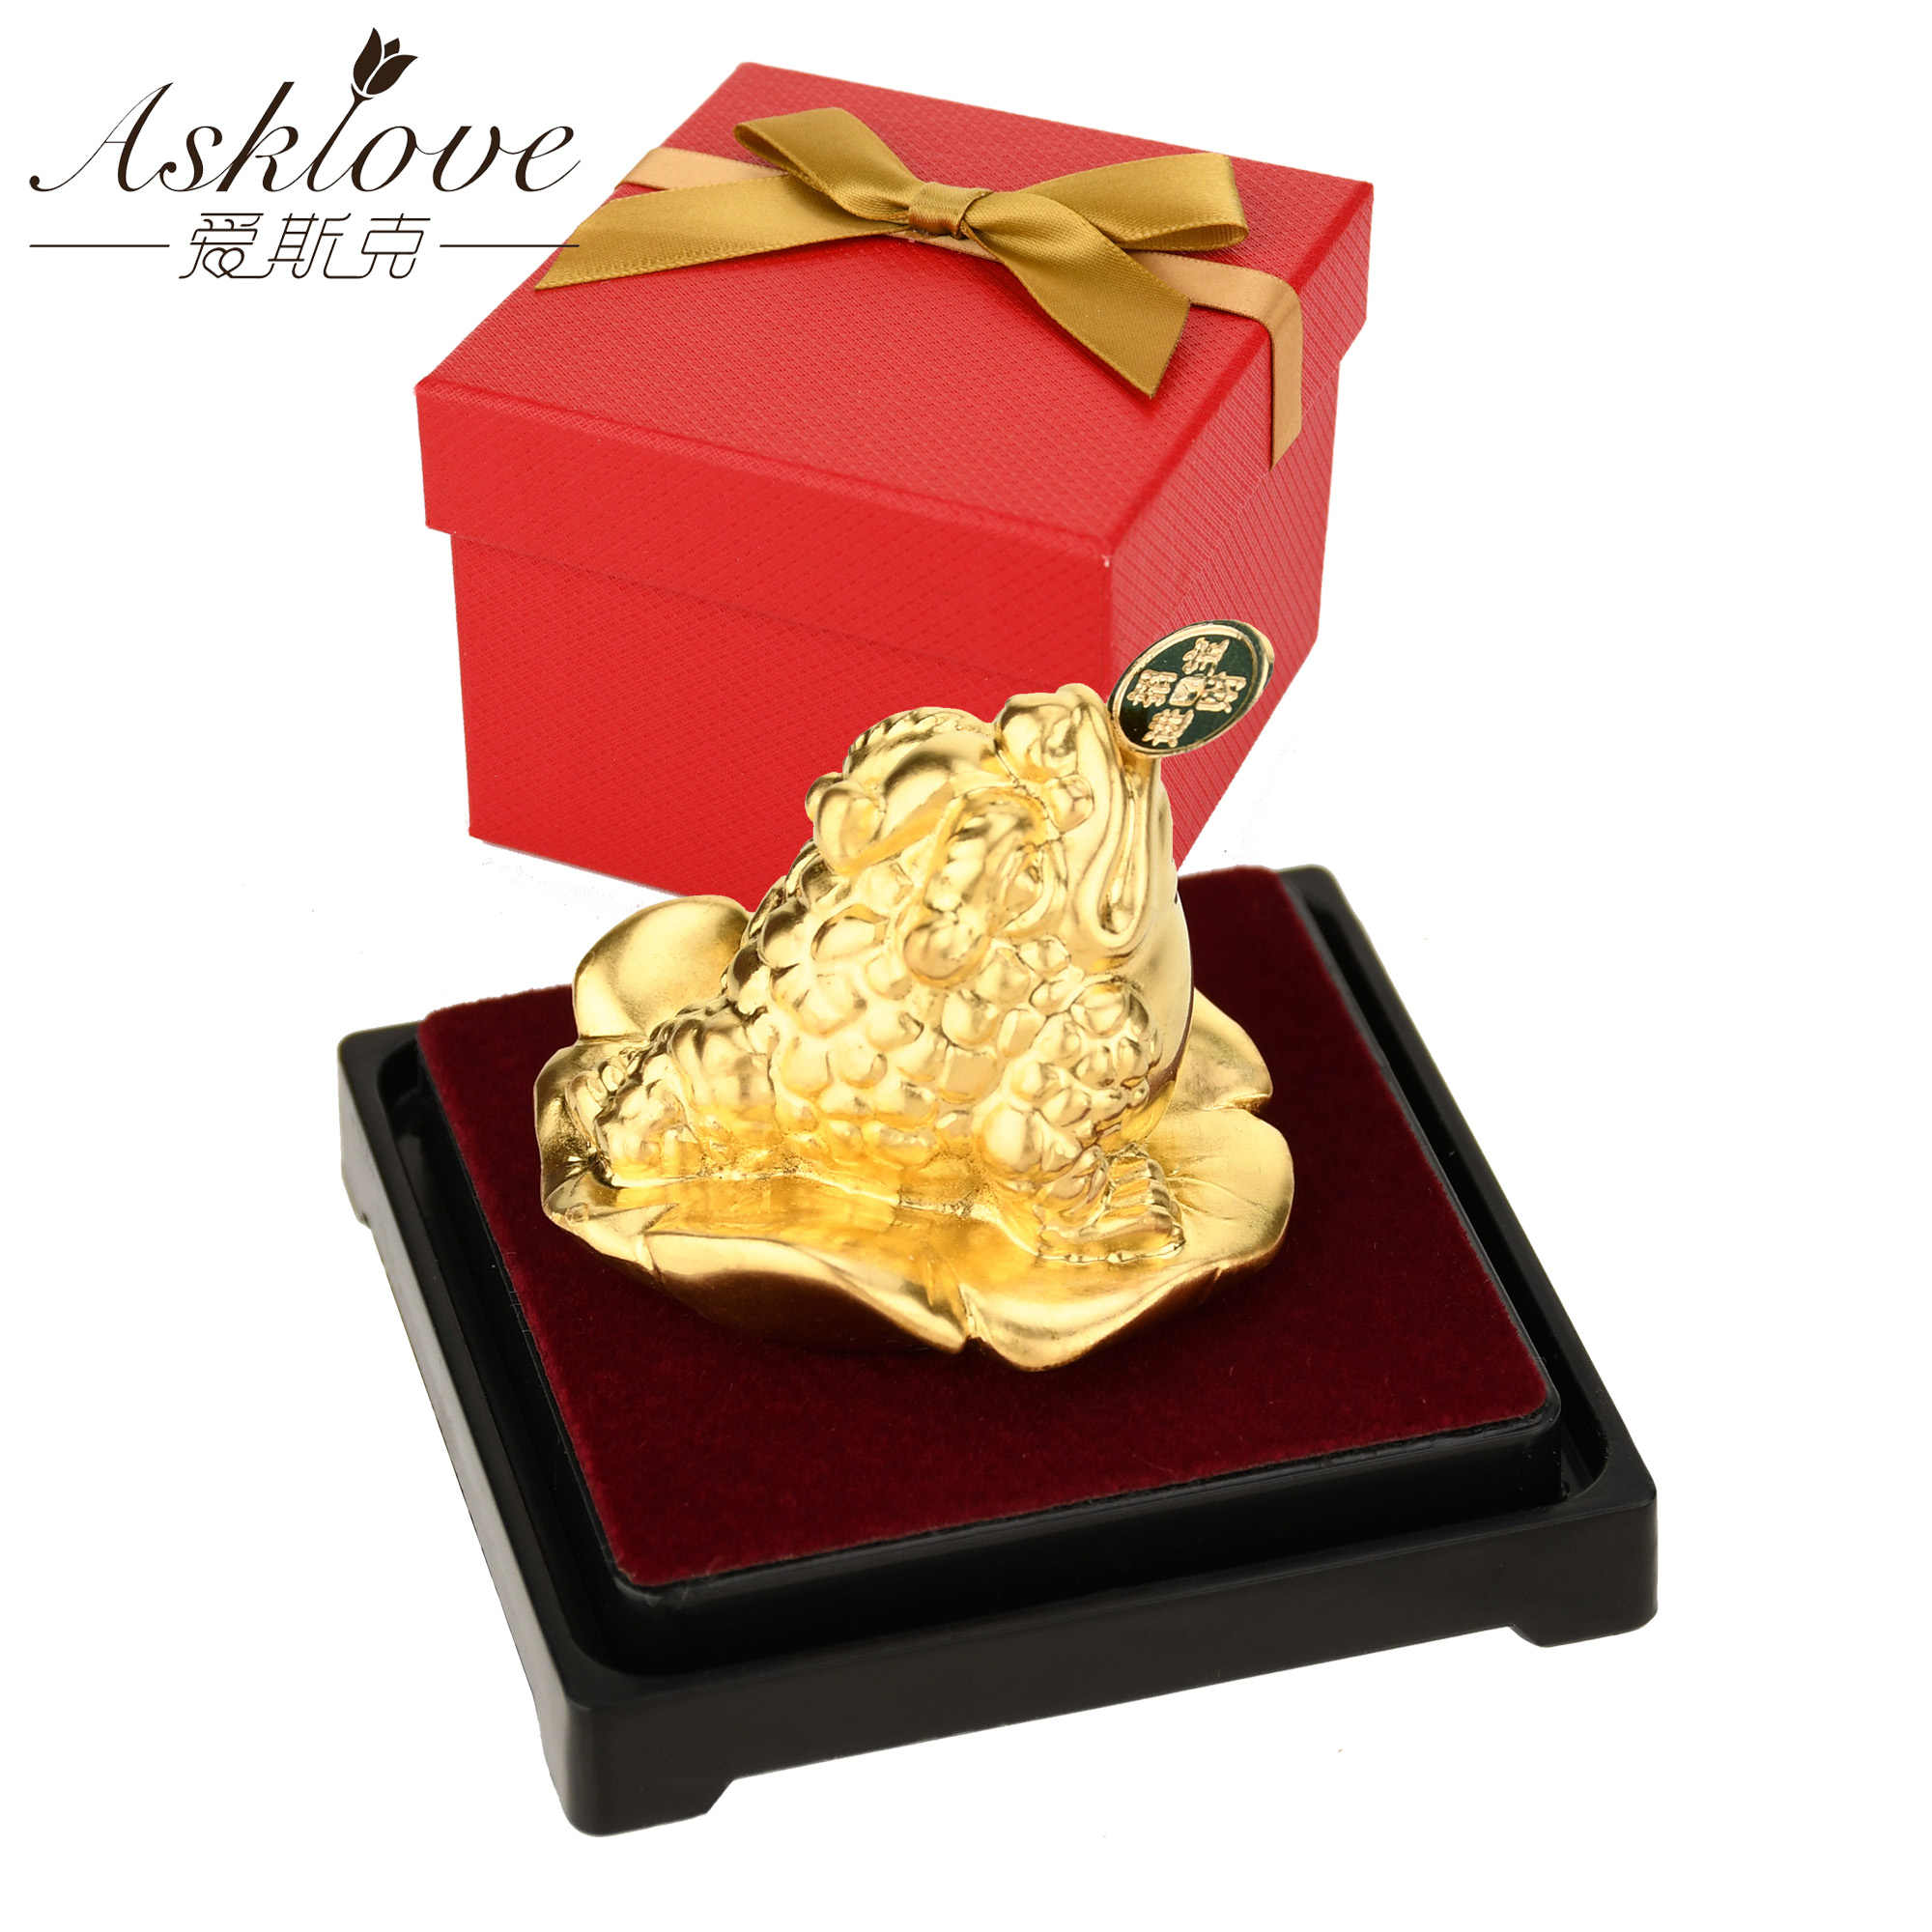 24 K Goud Folie Kikker Feng Shui Pad Chinese Gouden Kikker Geld Geluk Fortuin Rijkdom Kantoor Tafelblad Ornament Home Decor geluk Geschenken